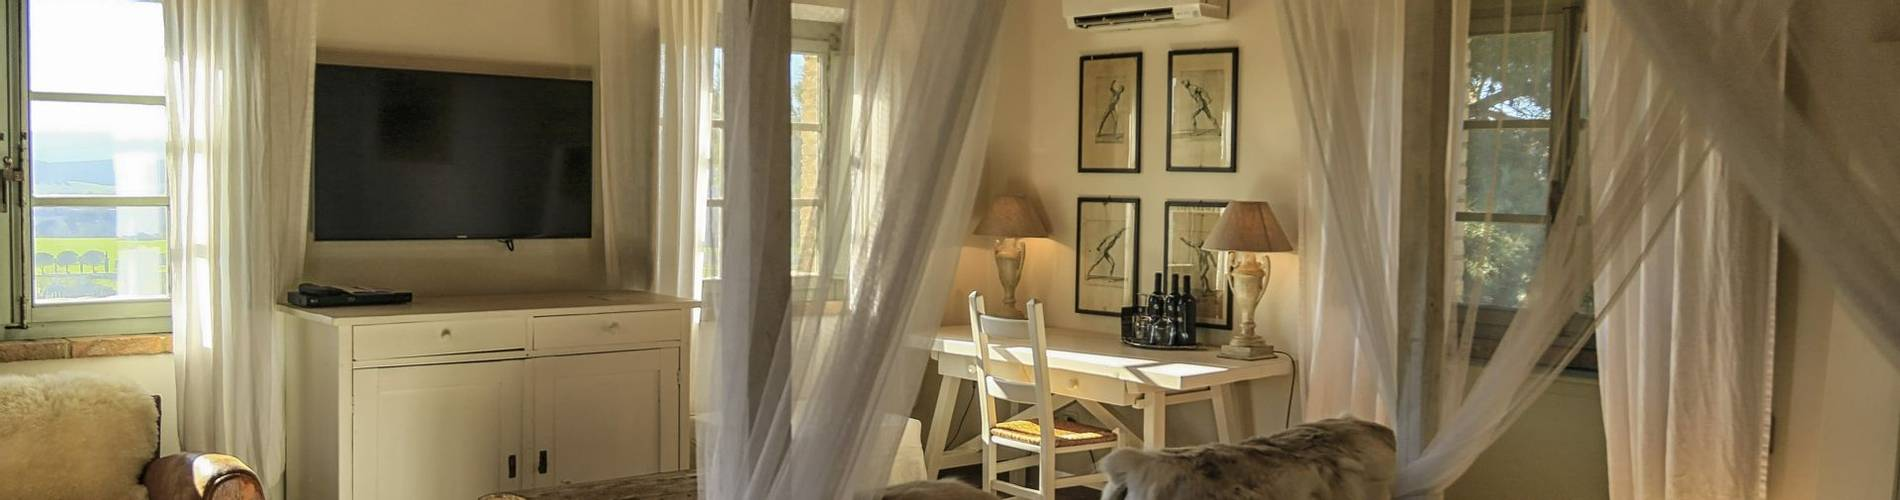 Conti Di San Bonifacio, Tuscany, Italy, Master Suite (6).jpg